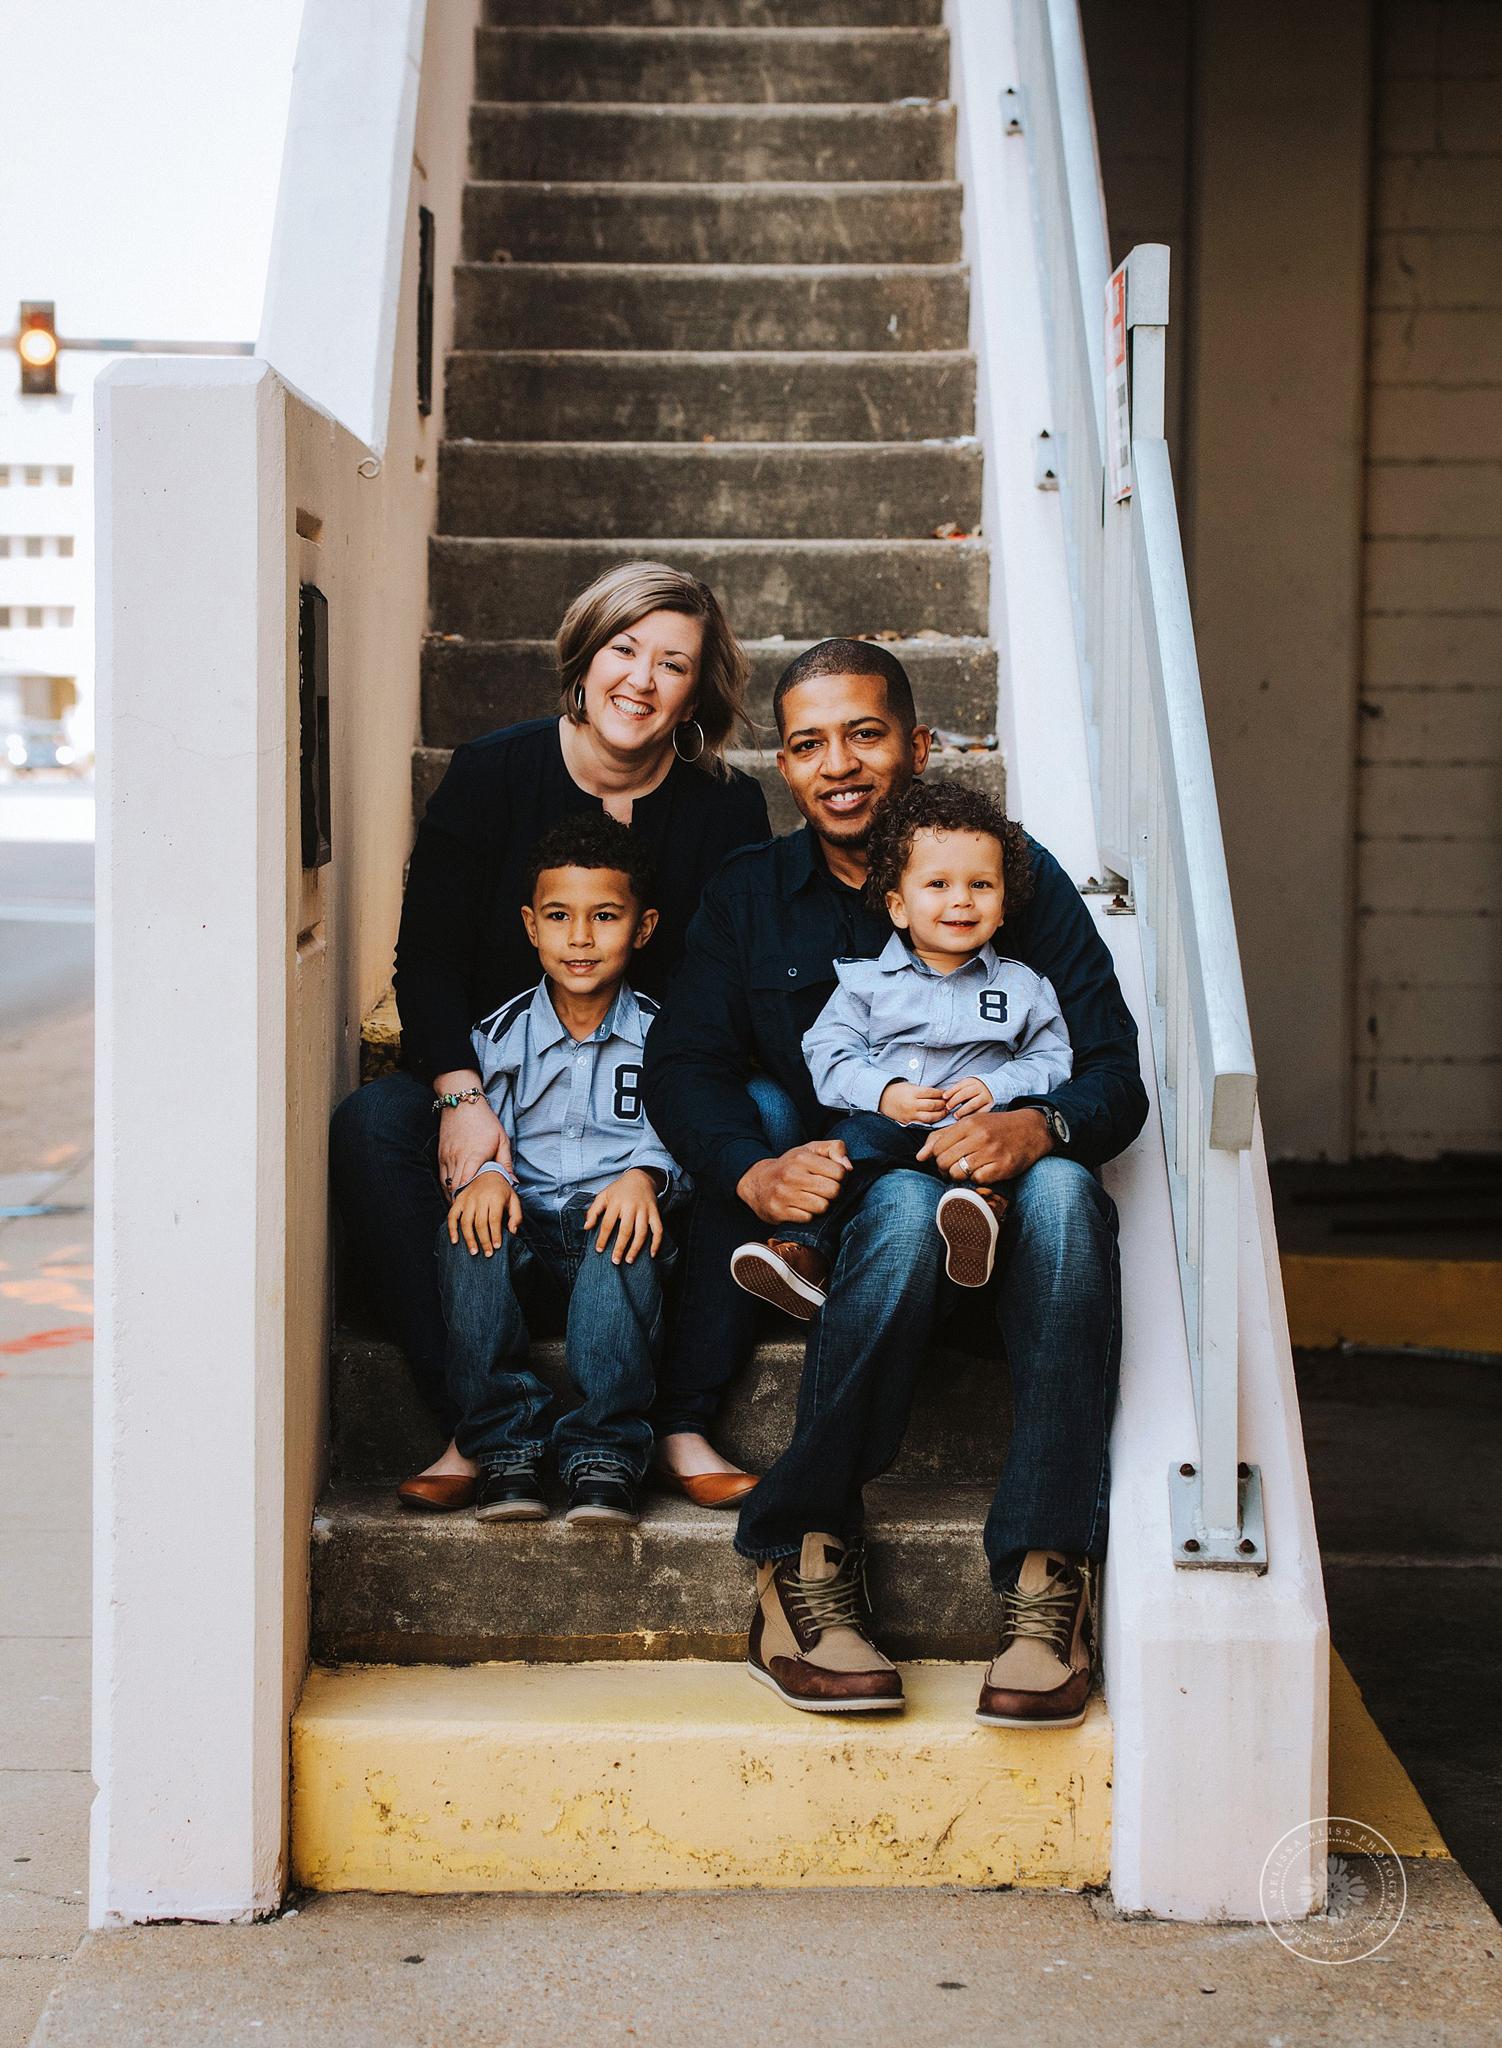 family-of-four-sitting-on-steps-urban-virginia-beach-melissa-bliss-photography